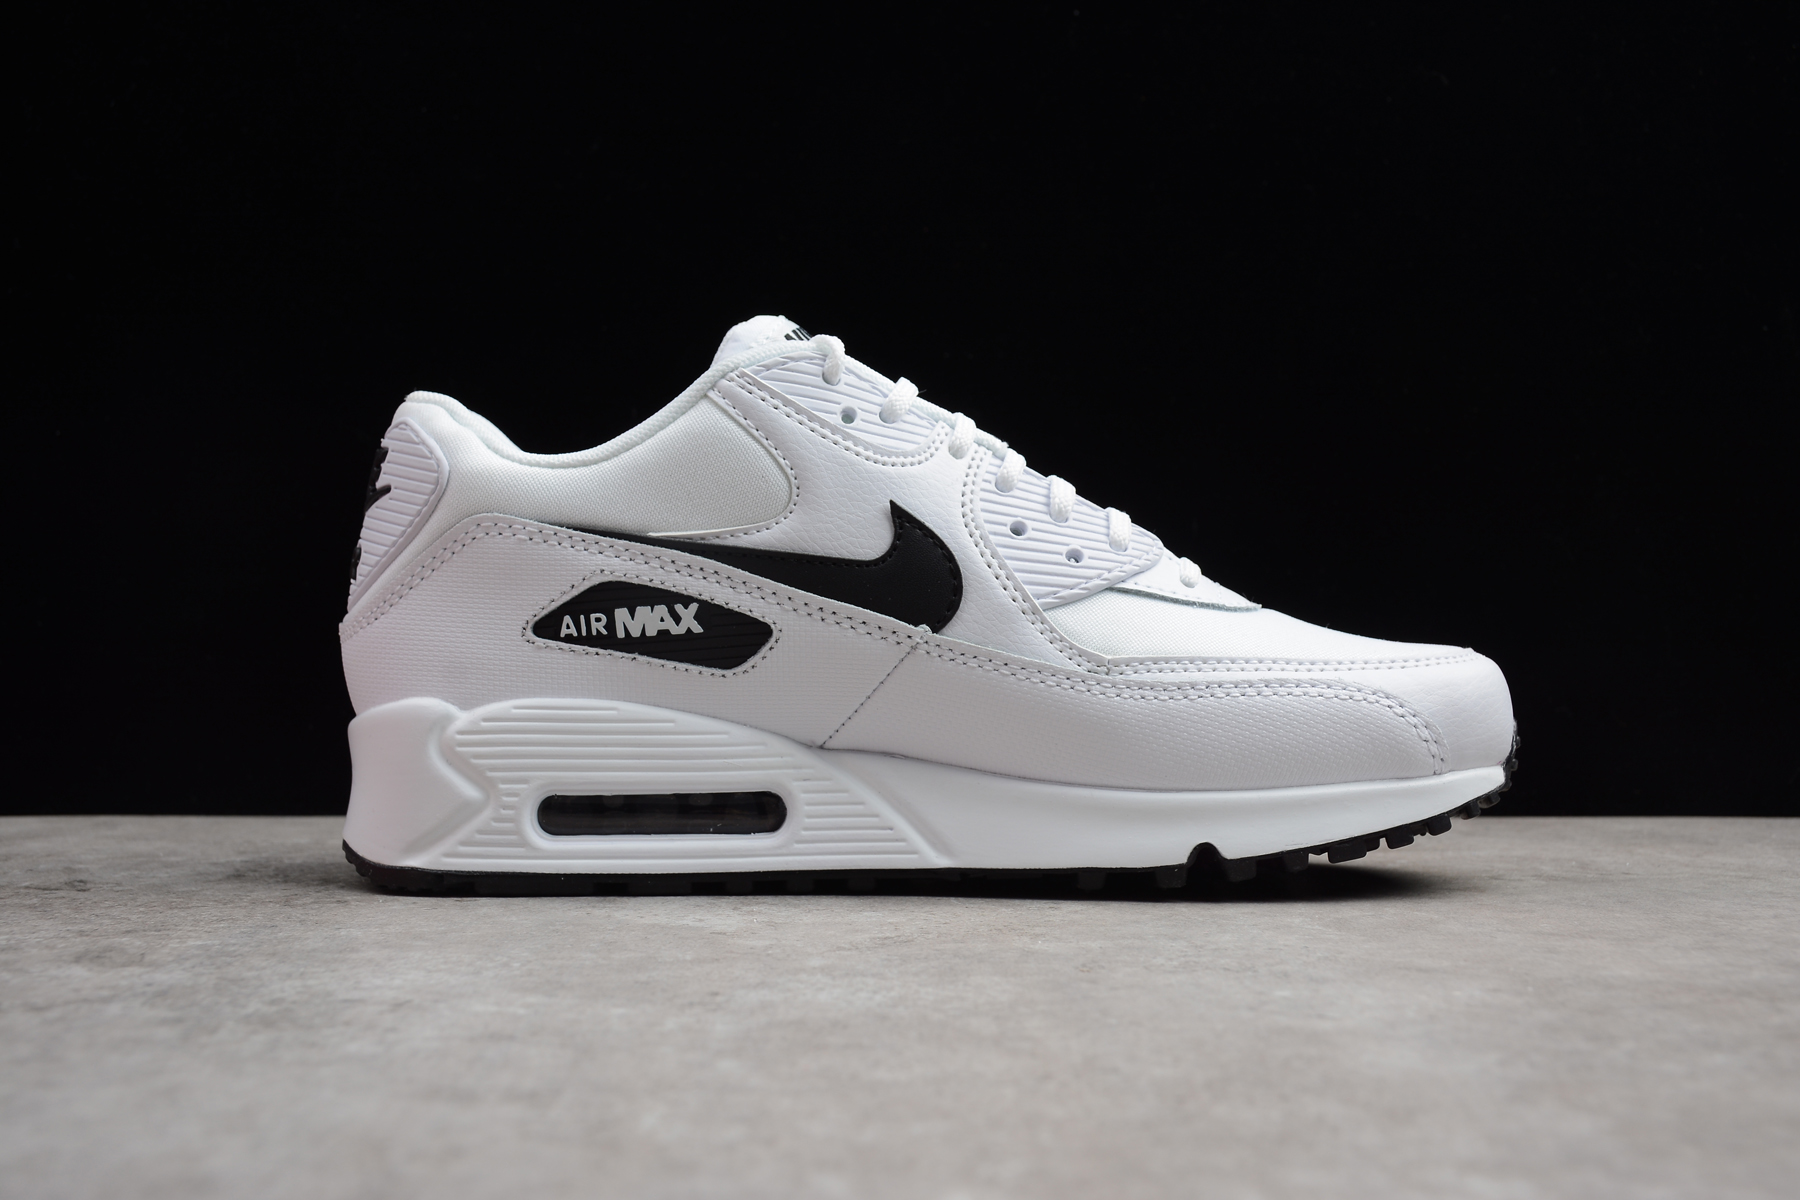 Nike Air Max 90 Essential White Black 325213-131 Men's Running Shoes